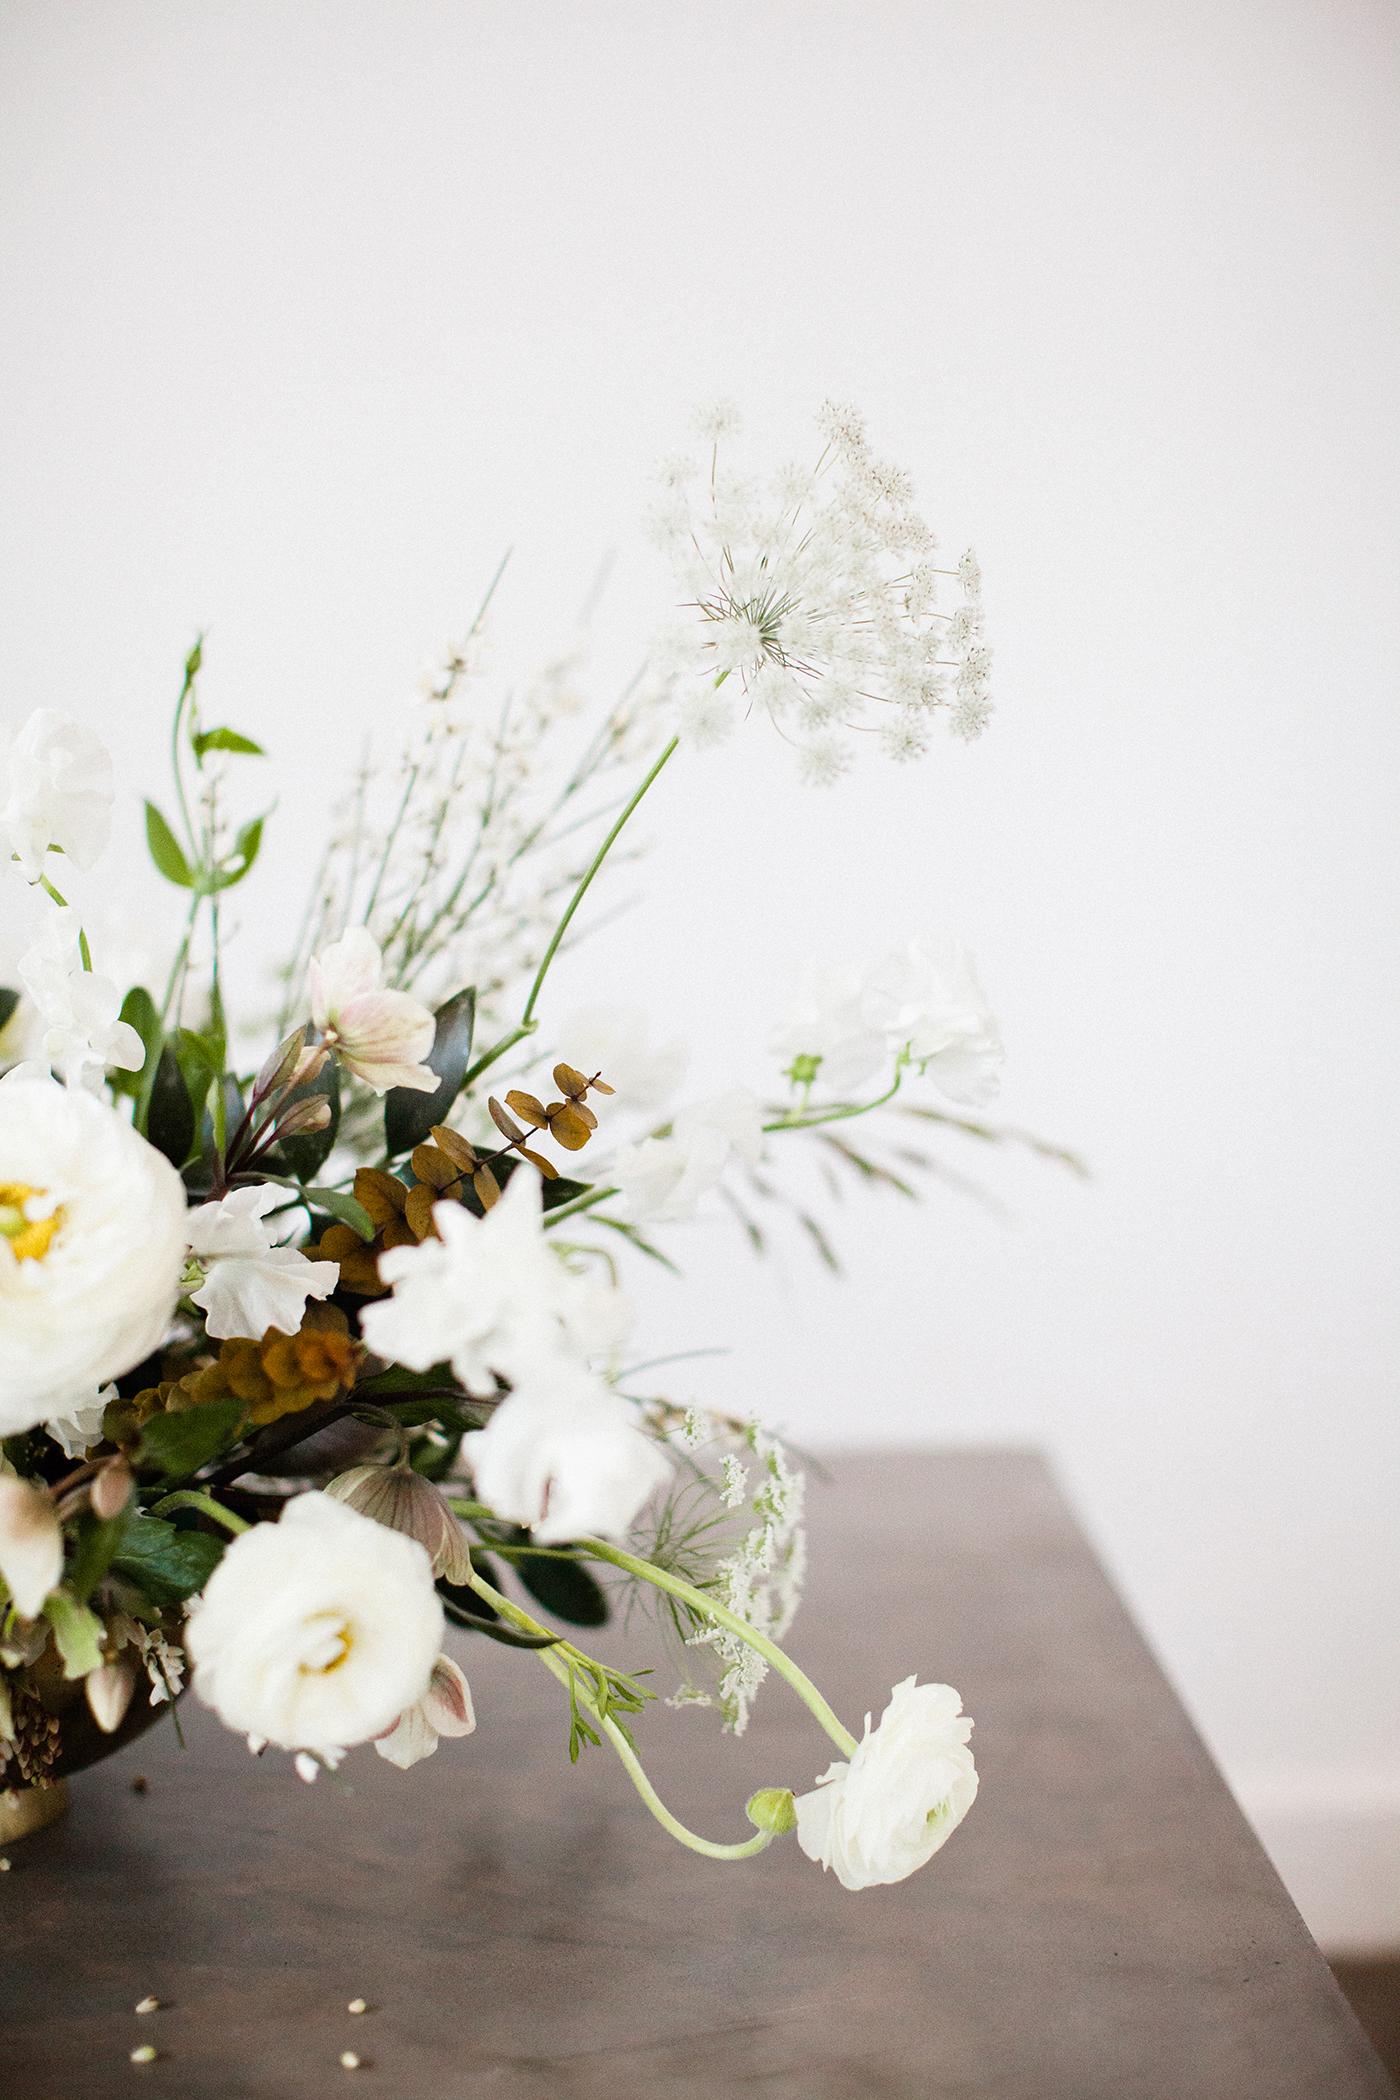 Wedding Floral Design Dallas - Olive Grove Design - Mimimalist Fall Wedding - 00018.jpg